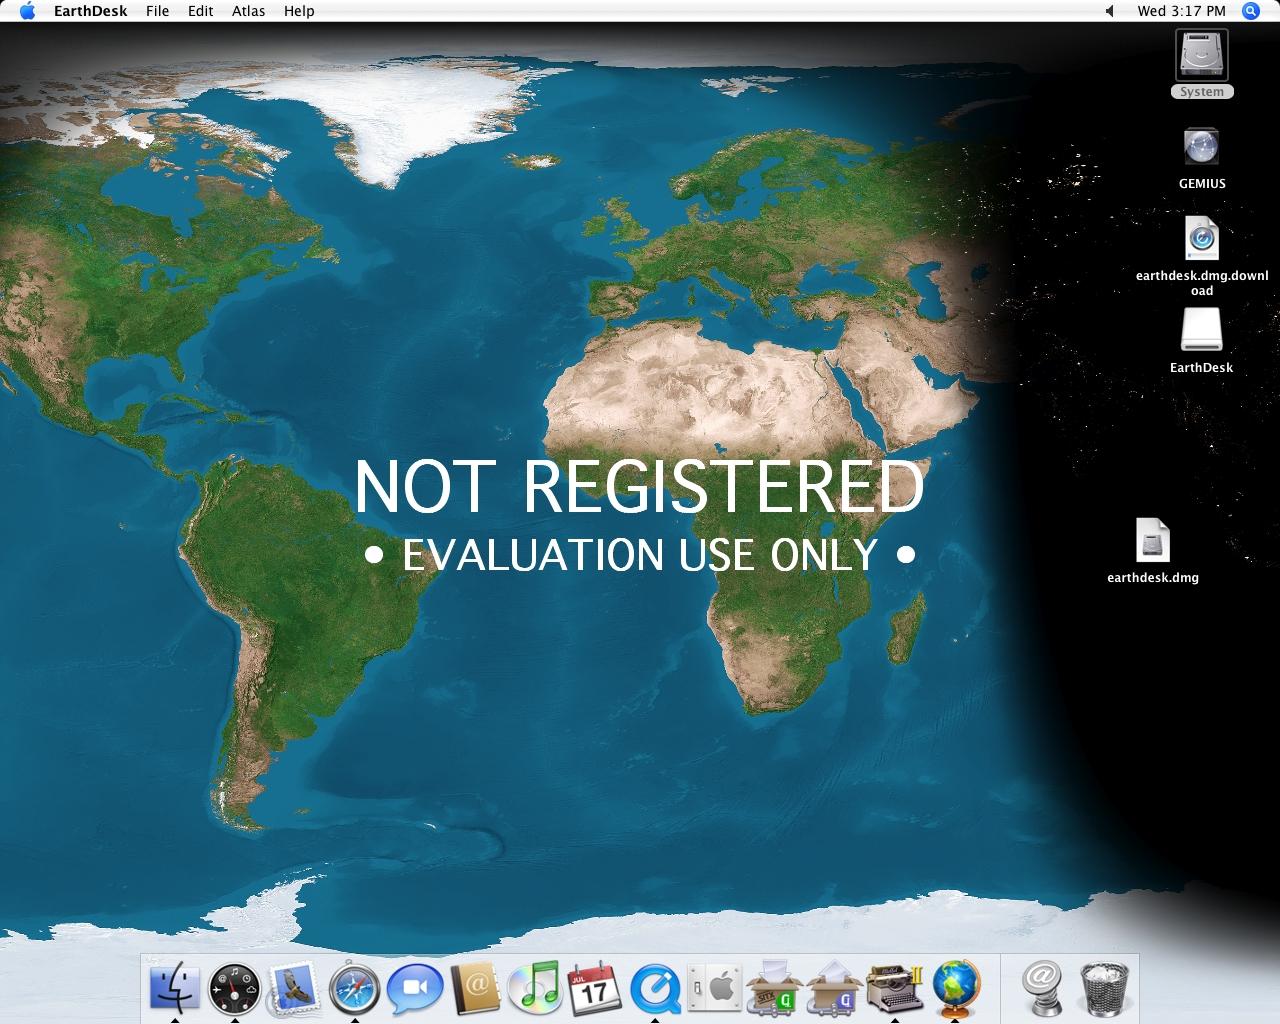 Bezpieczeństwo. EarthDesk 4.2. Cloud Computing. DataCenter. Edukacja.